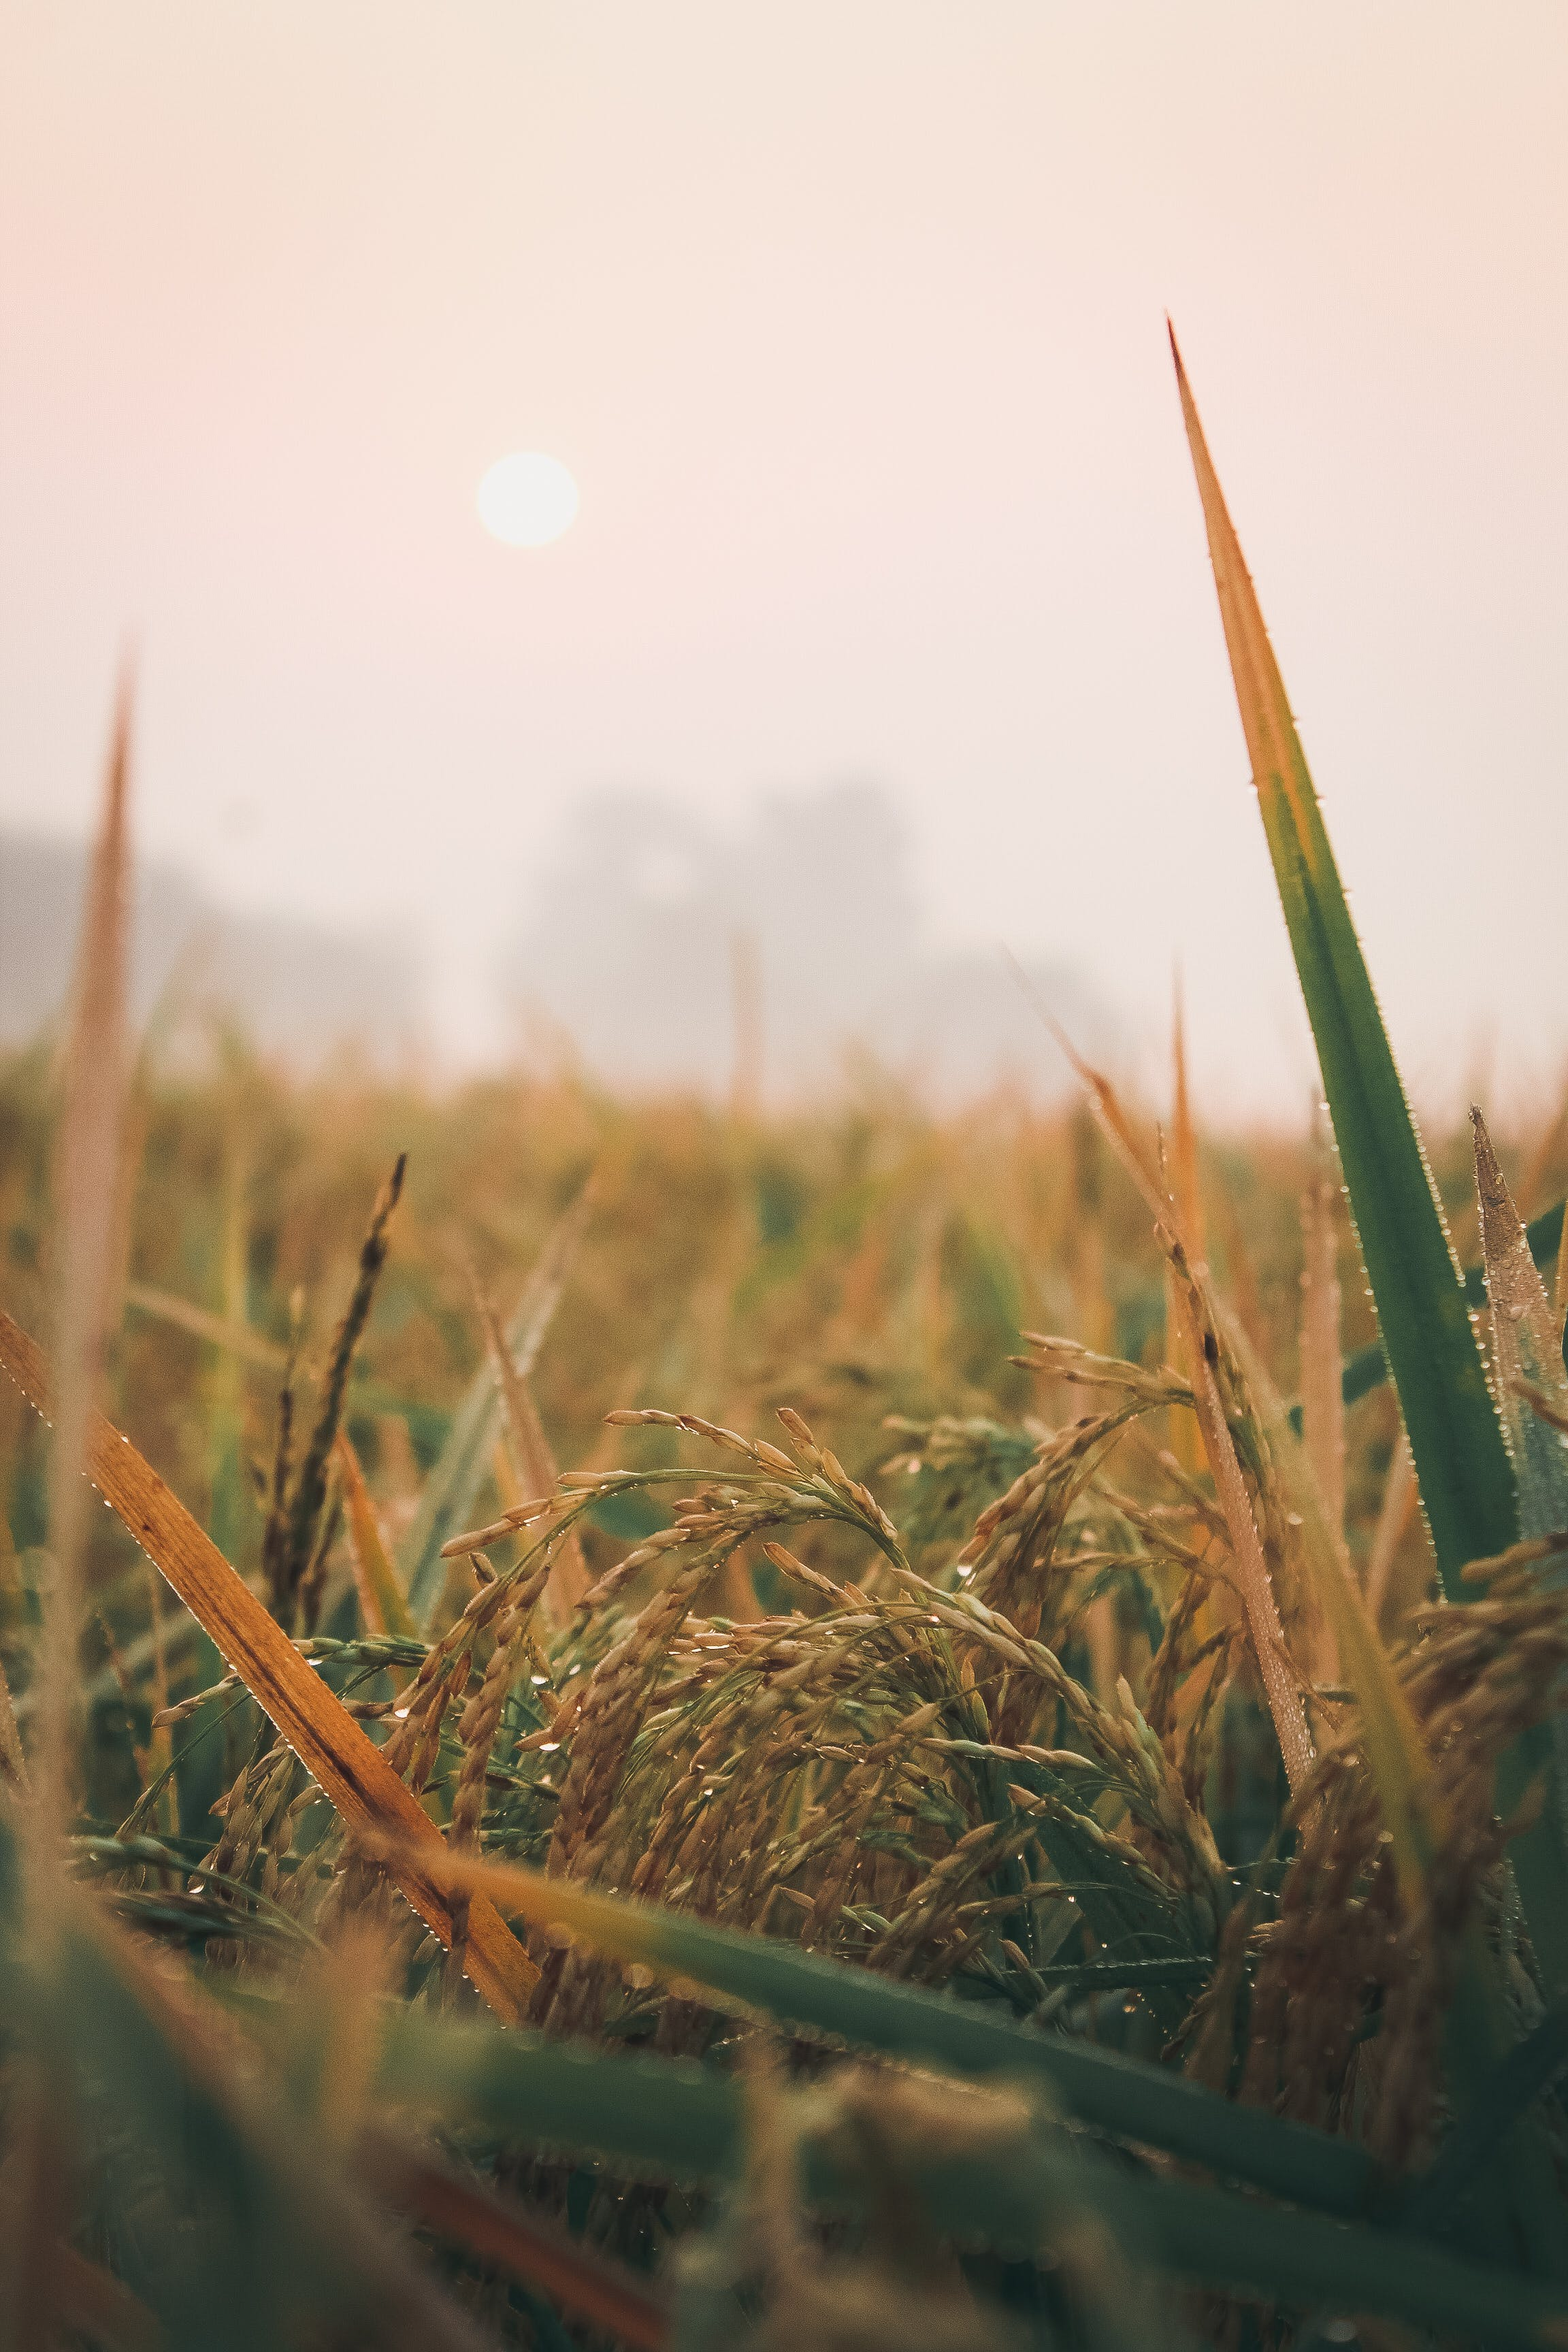 Free stock photo of crop, dew, field, glow